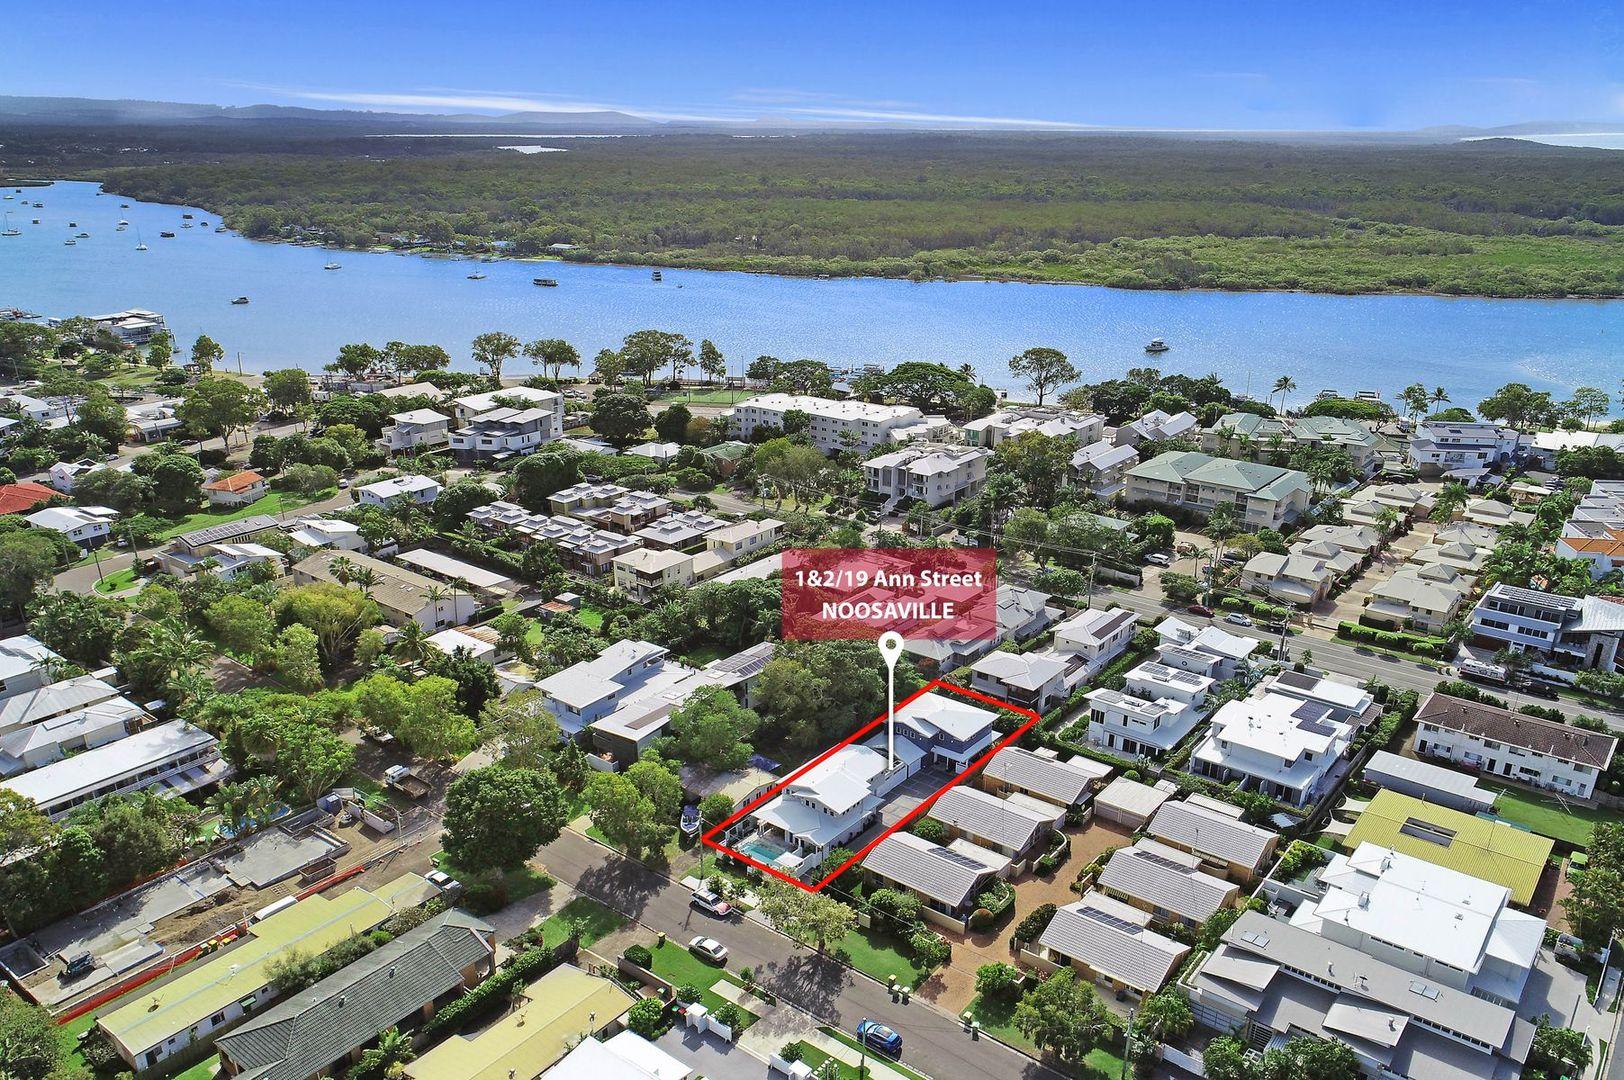 1/19 Ann Street, Noosaville QLD 4566, Image 1